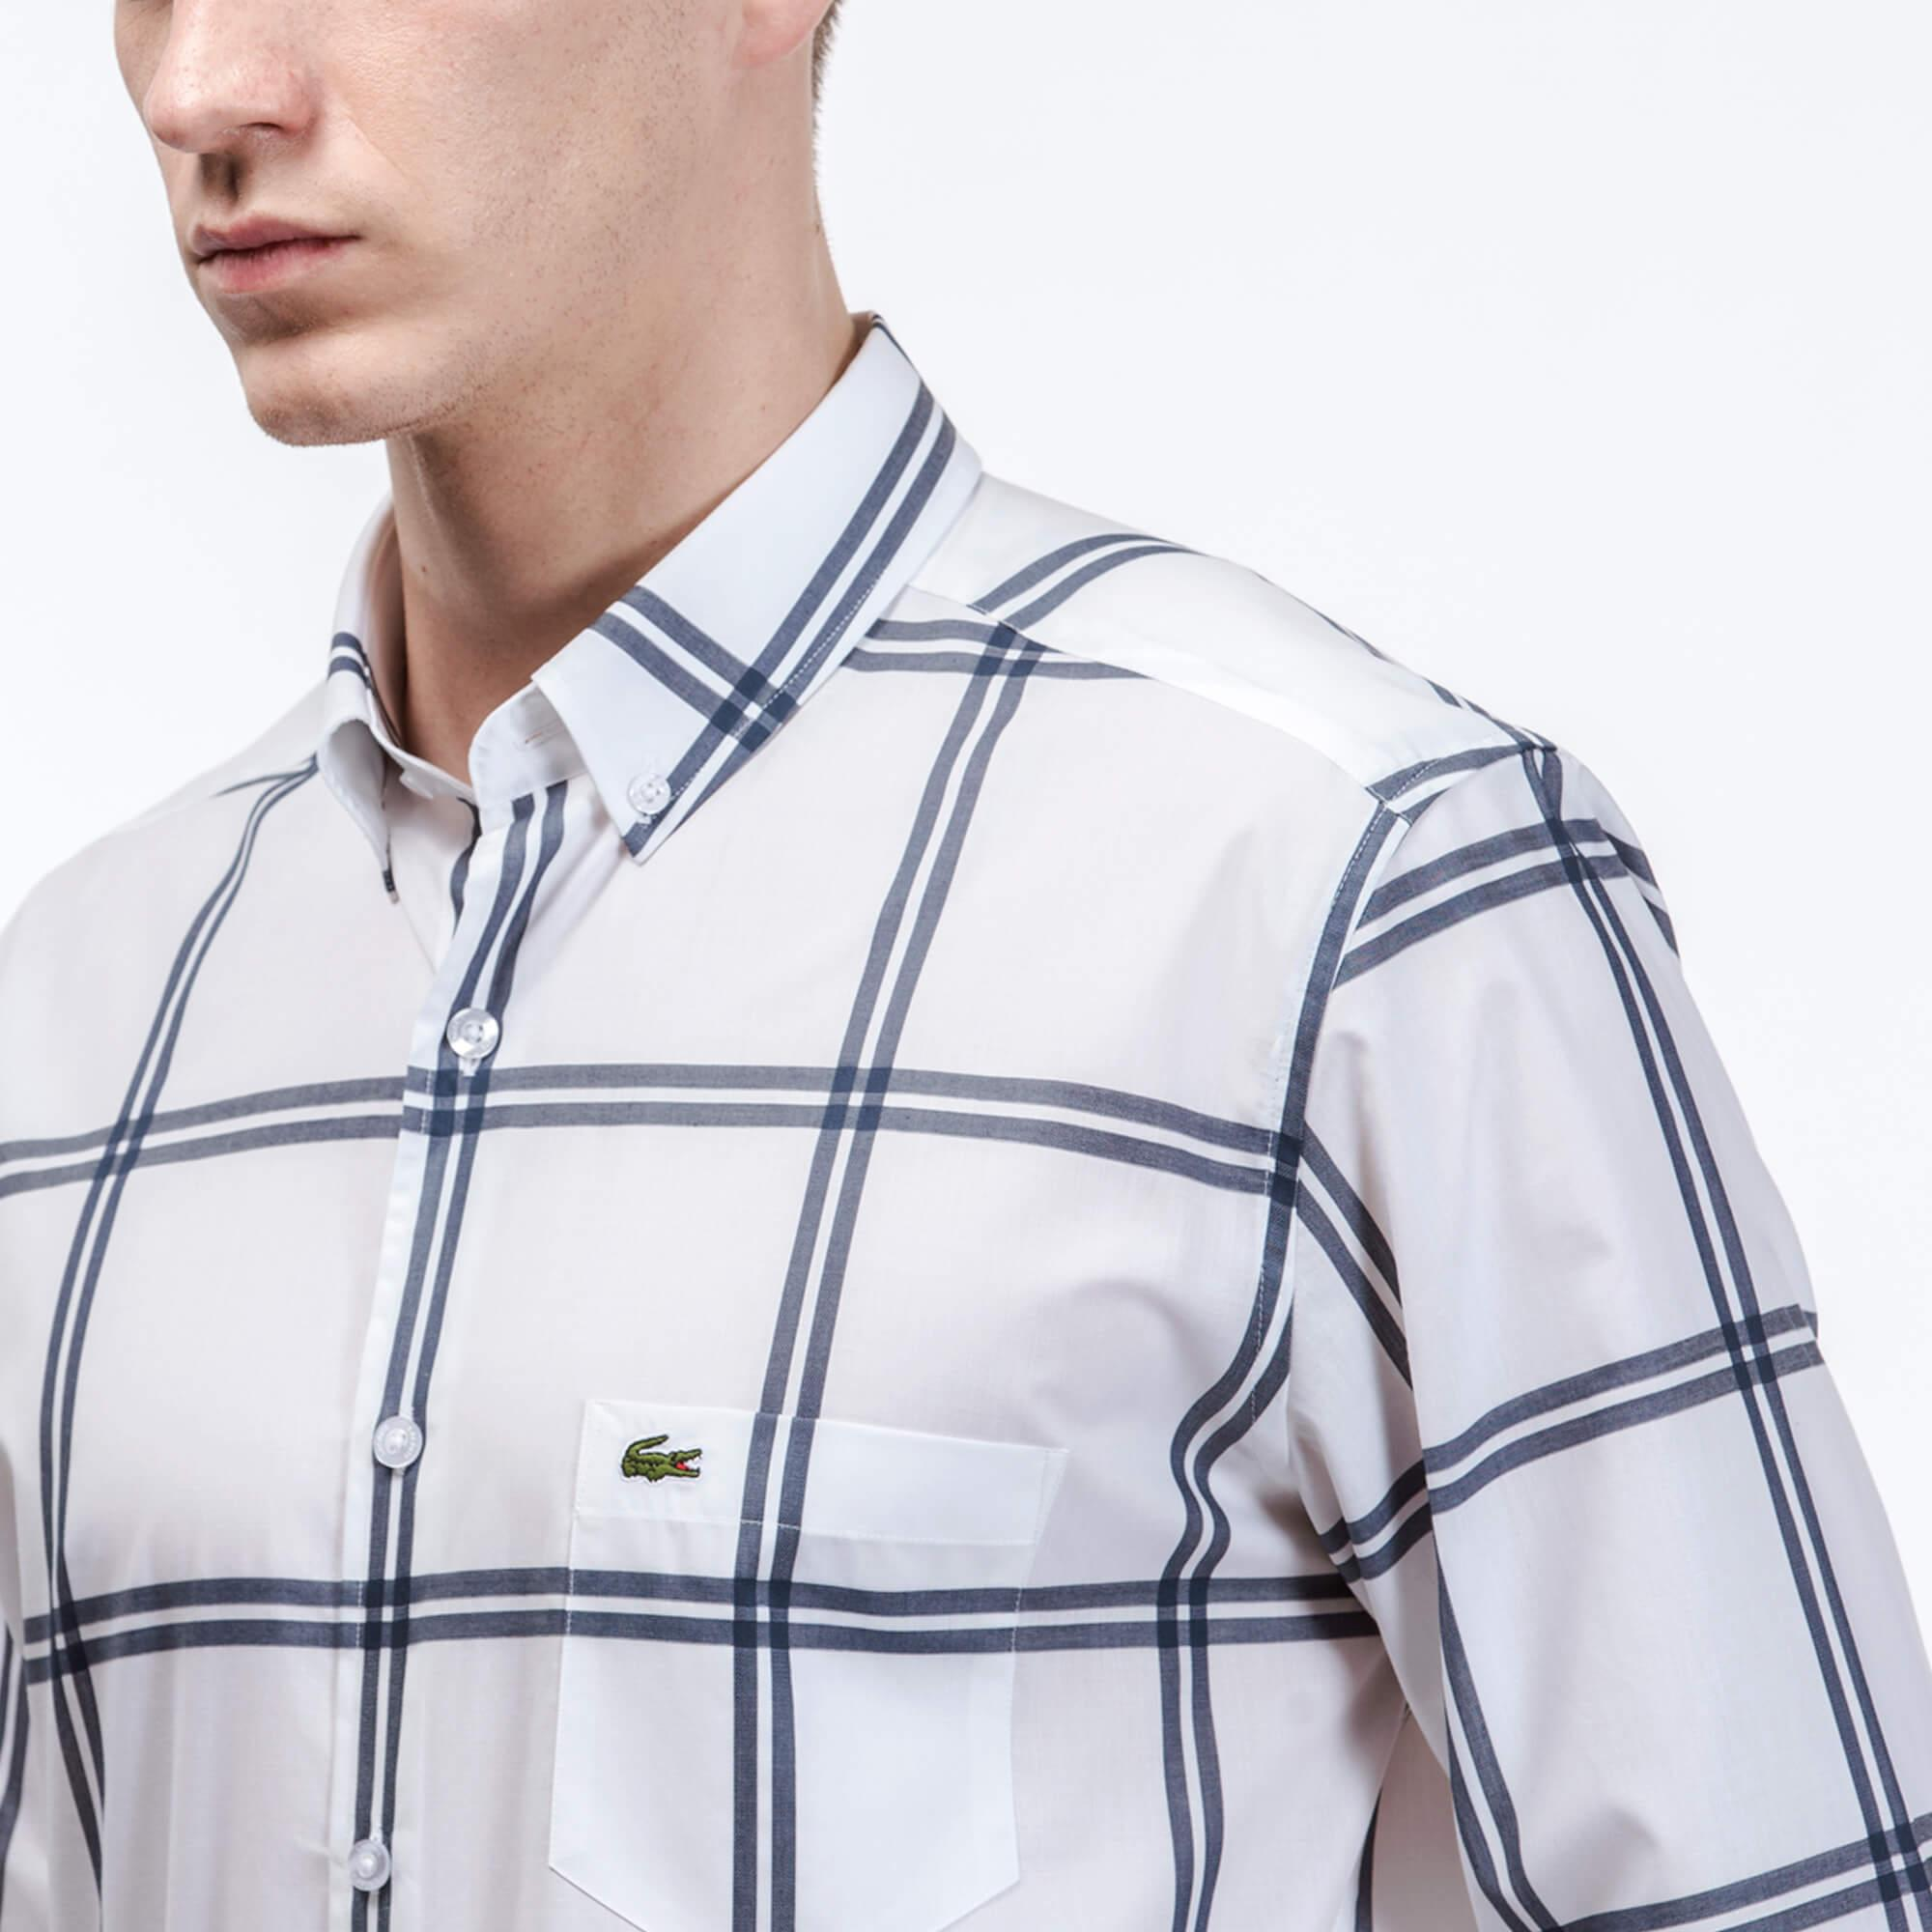 Lacoste Erkek Regular Fit Lacivert Çizgili Gömlek